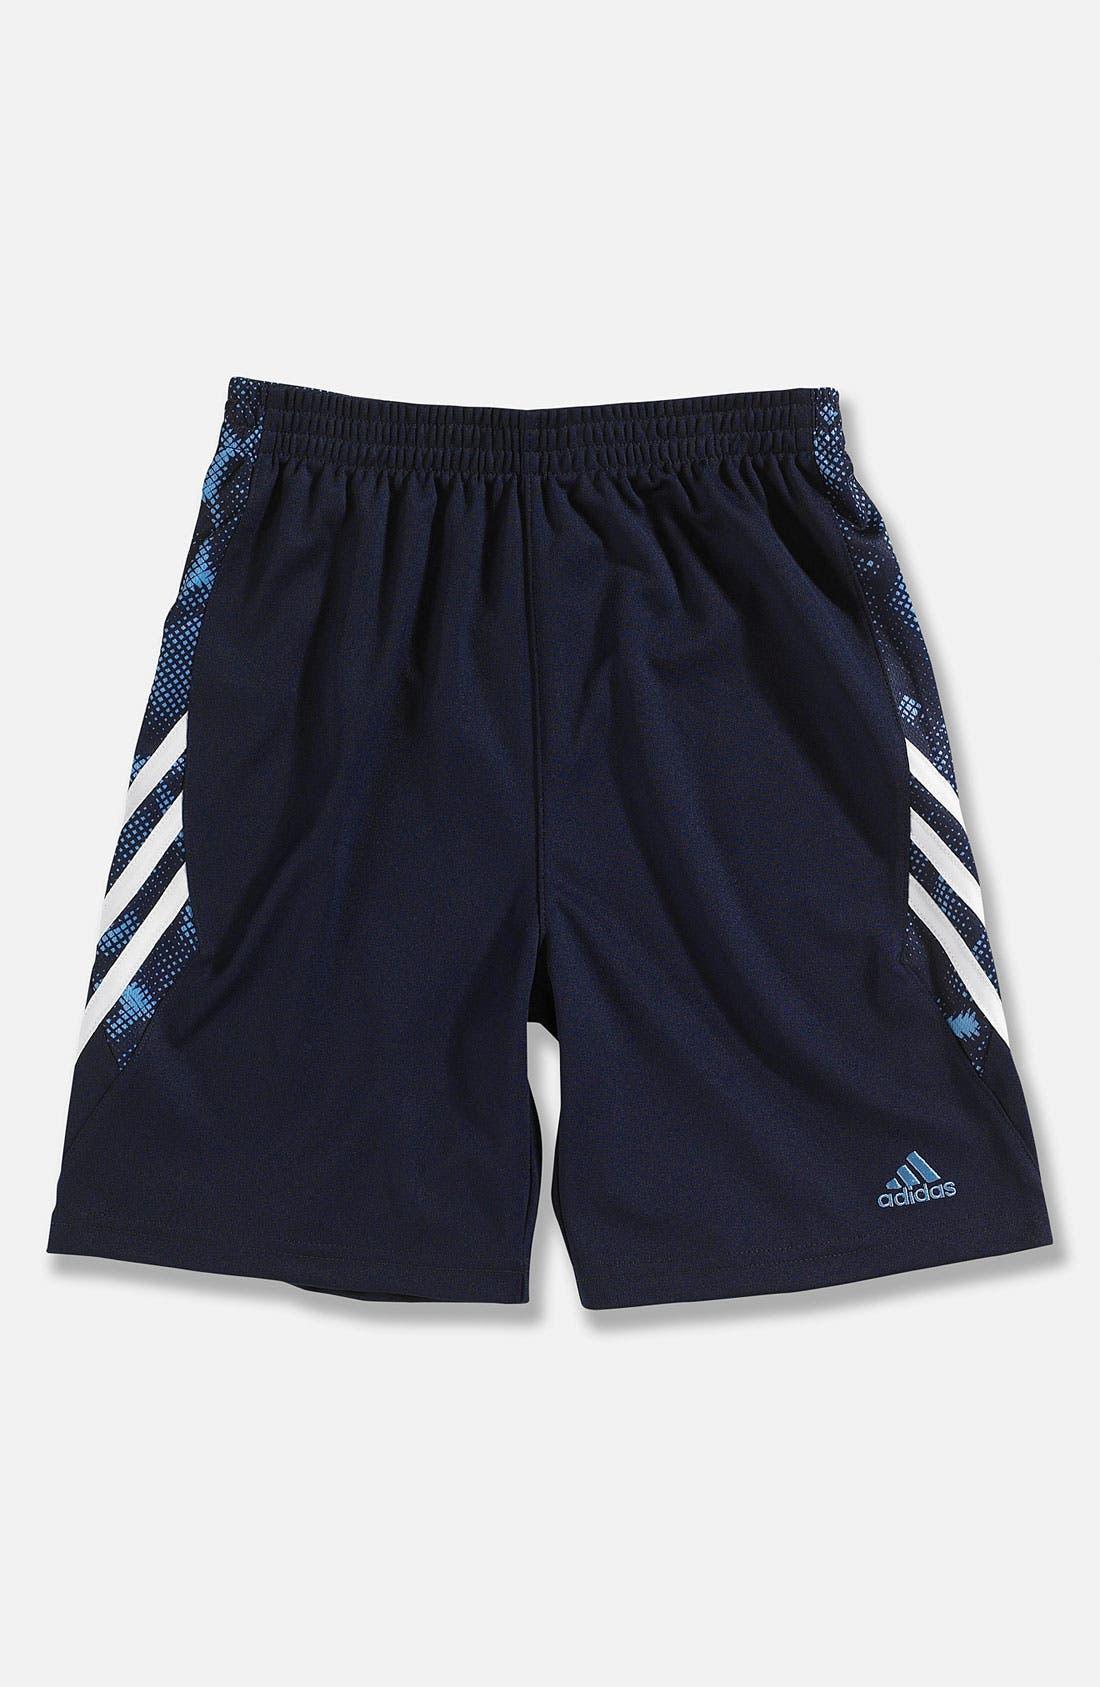 Alternate Image 1 Selected - adidas 'Lethal' Shorts (Little Boys)